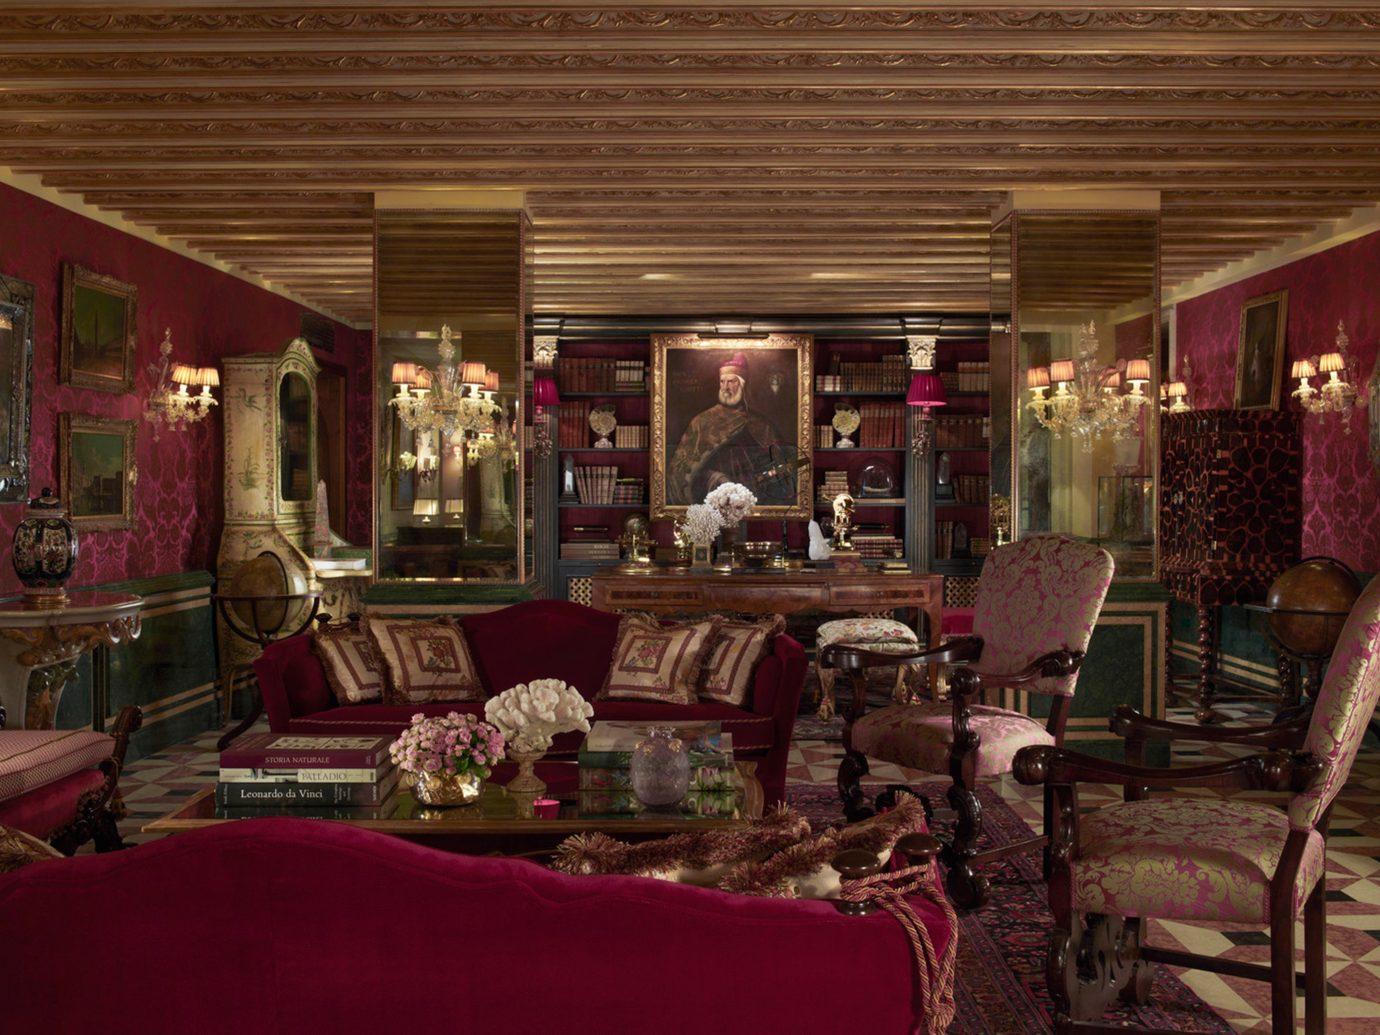 City Elegant Historic Lounge Luxury Trip Ideas room indoor Living restaurant red interior design meal Boutique furniture Bar area several